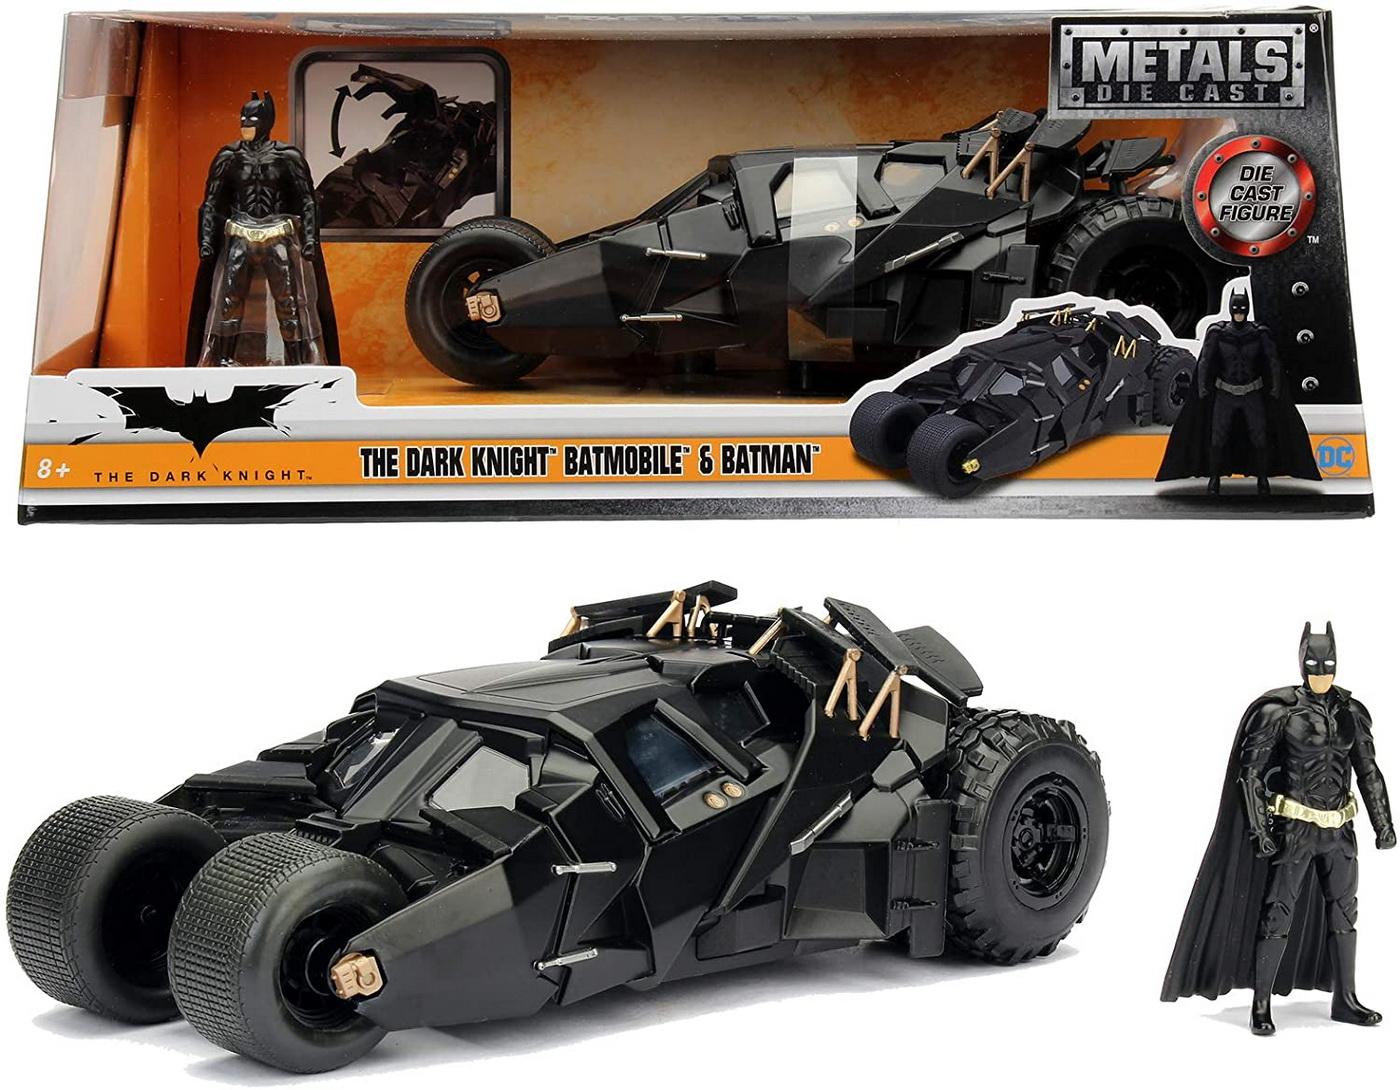 Batman Automobil Batmobile The Dark Knight 1:24